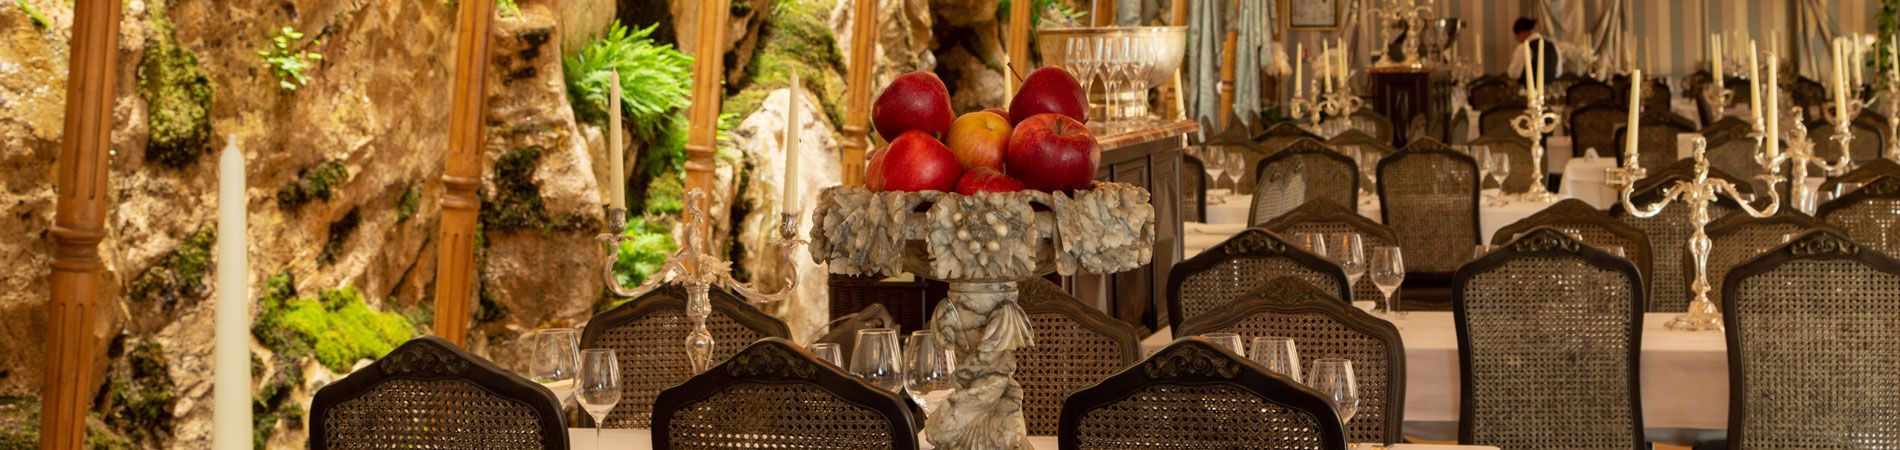 le grand buffet narbonne decoration